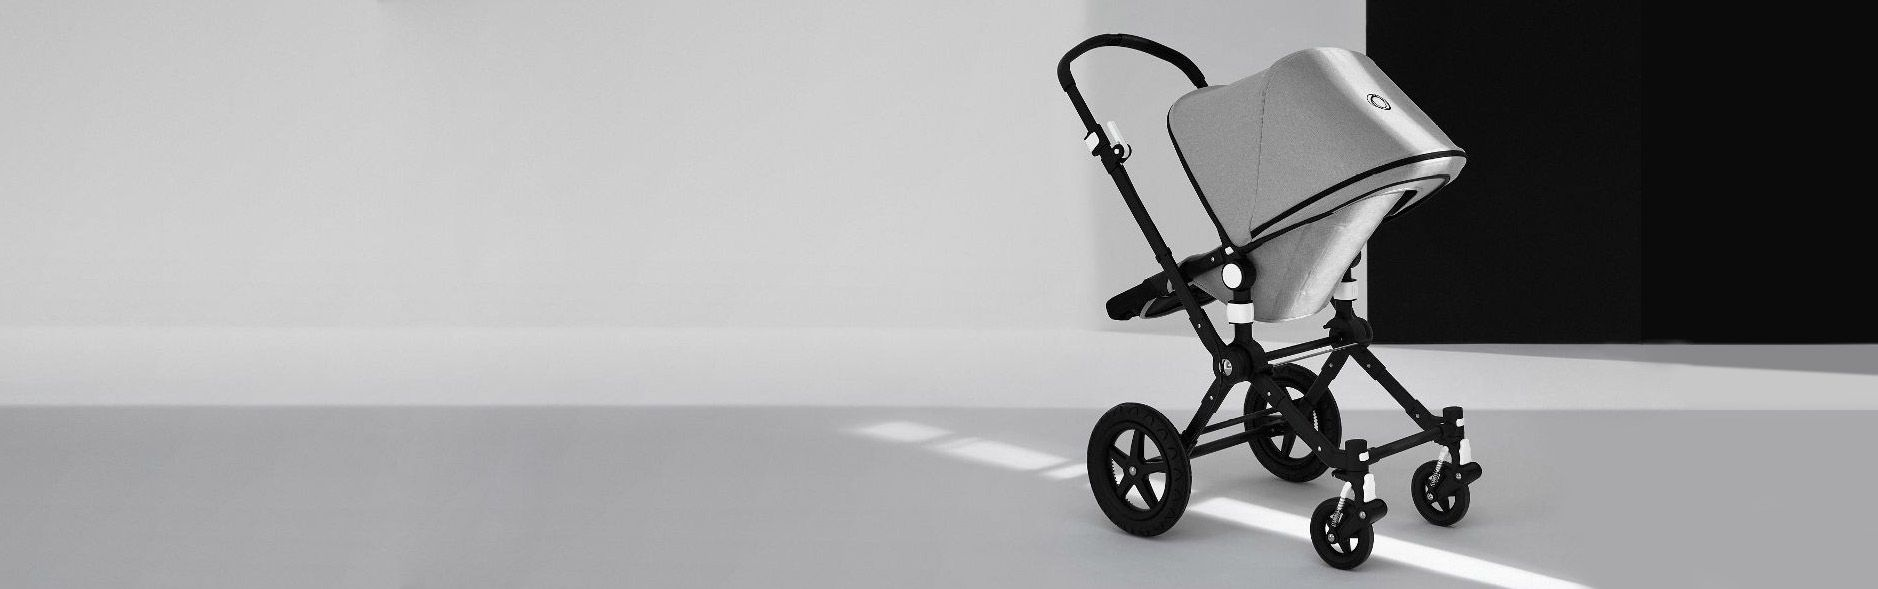 Bugaboo Atelier Limited Edition dječja kolica